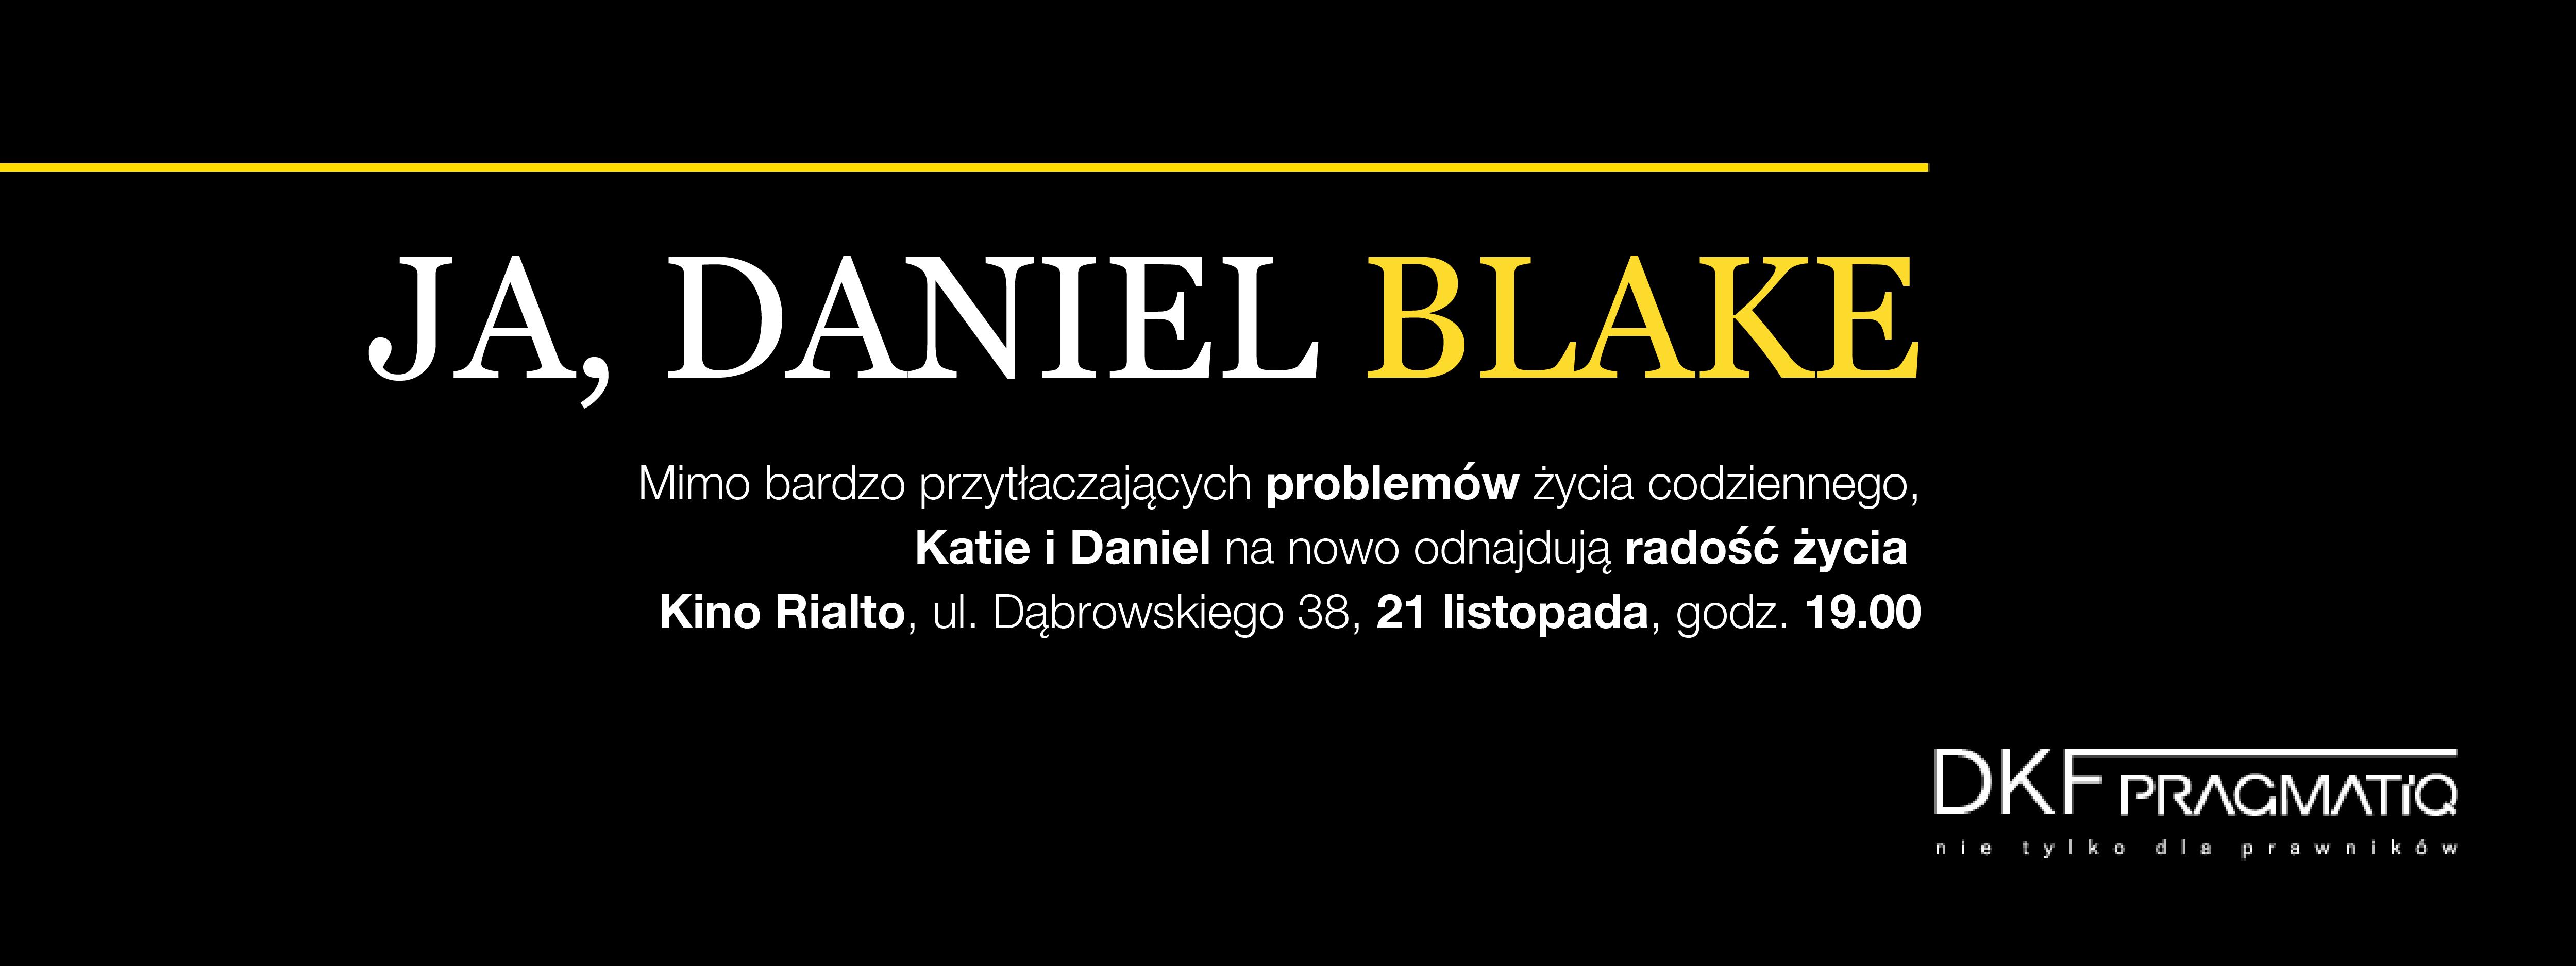 baner-ja-daniel-blake